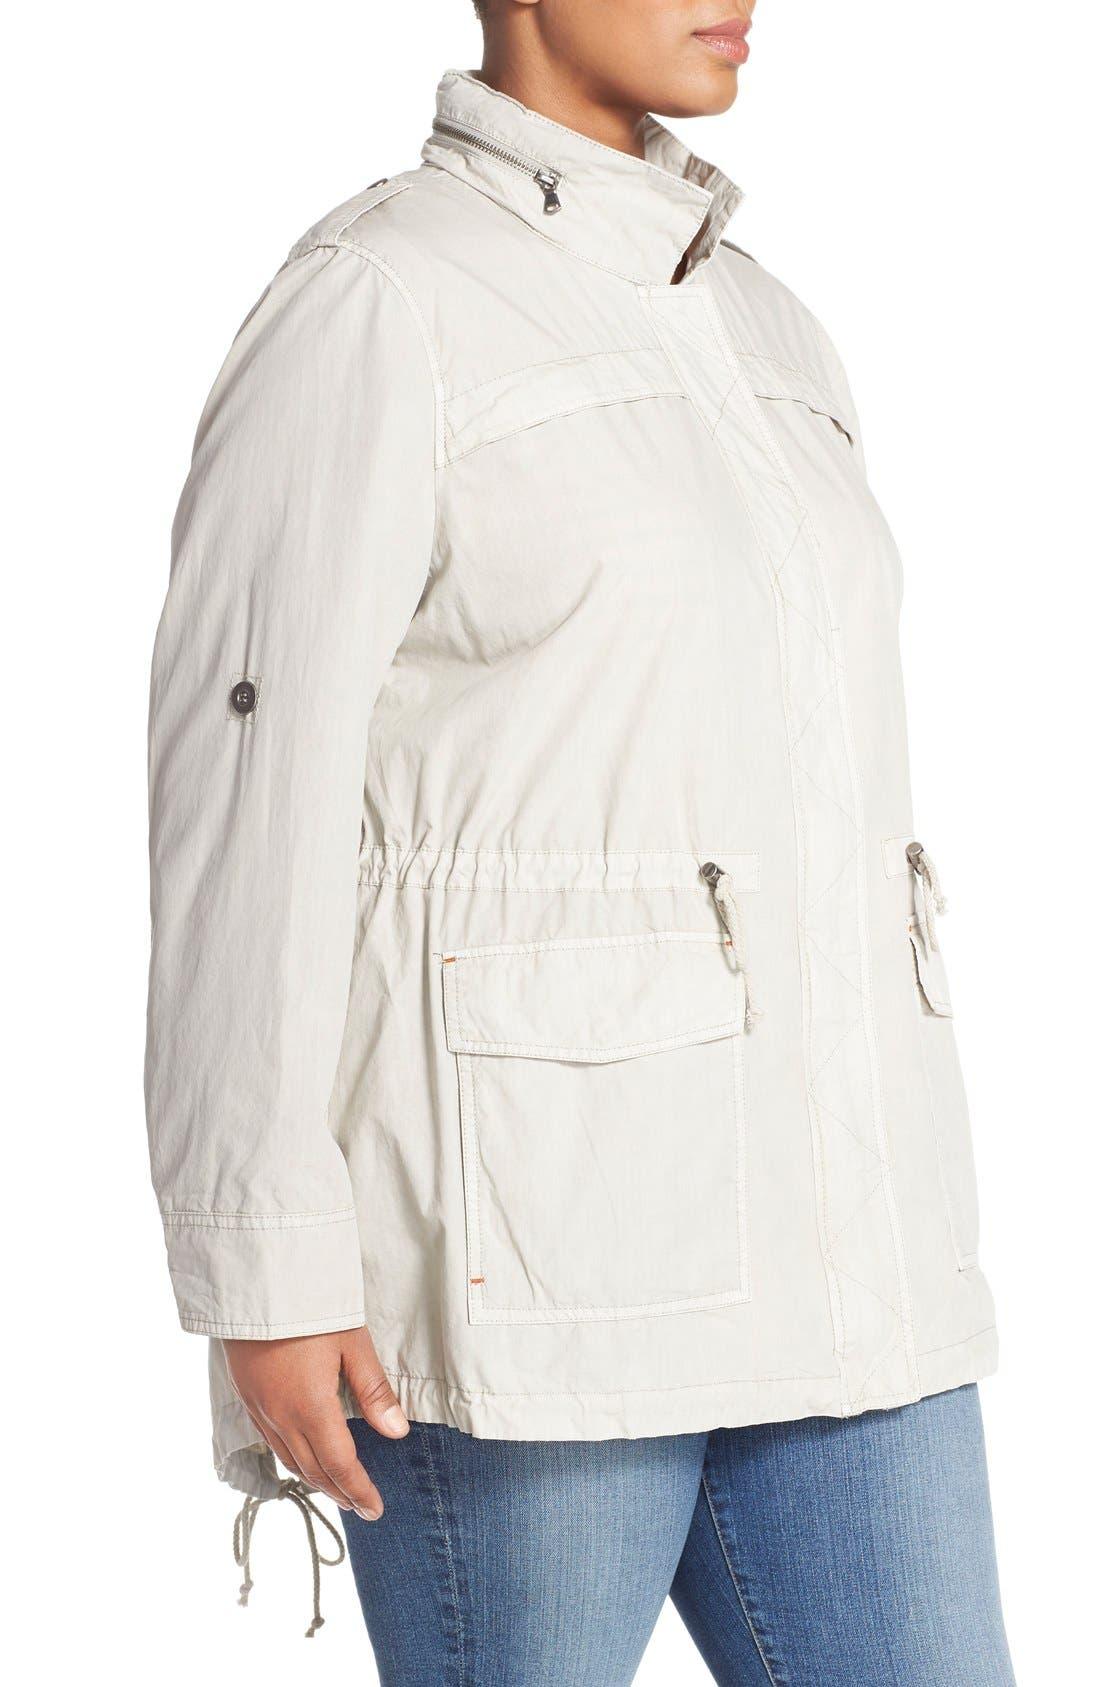 Parachute Hooded Cotton Utility Jacket,                             Alternate thumbnail 3, color,                             Moonbeam